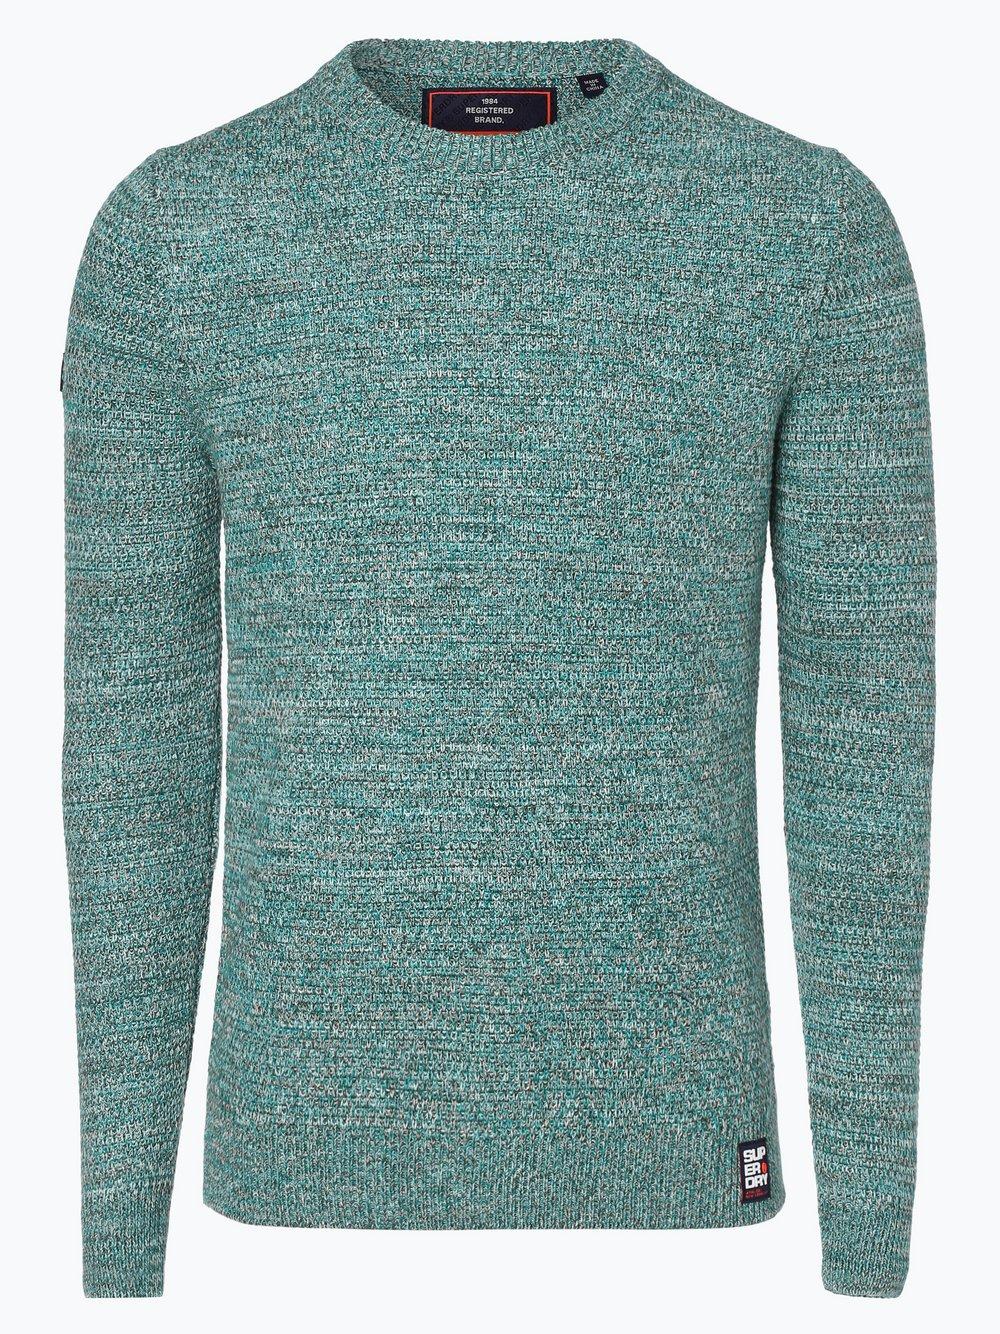 Superdry - Sweter męski, niebieski